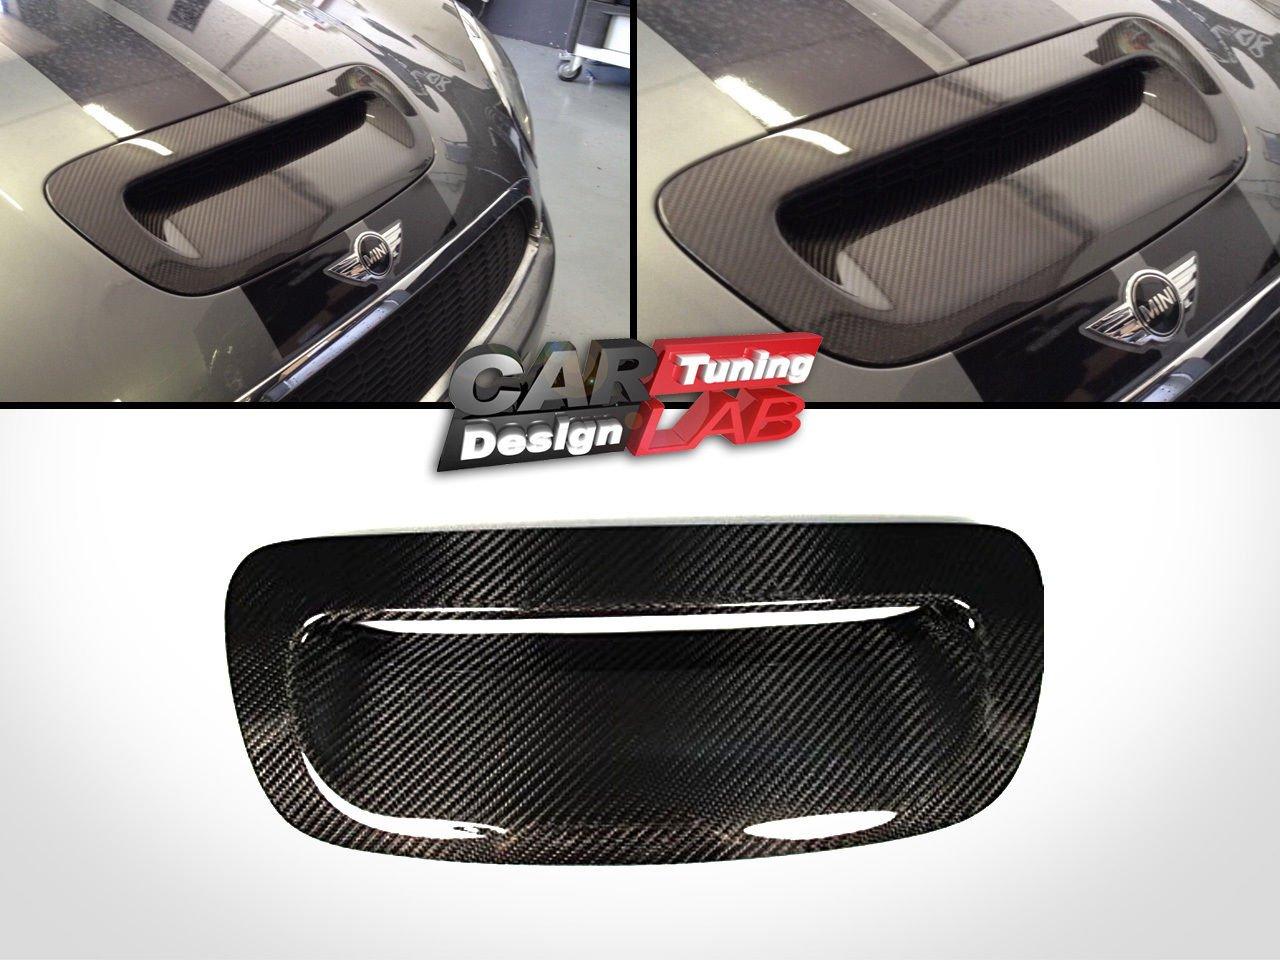 (1) Carbon Fiber Hood Grill Vent Cover for 2007-2013 Mini Cooper R55 R56 R57 R58 R59 CarLab